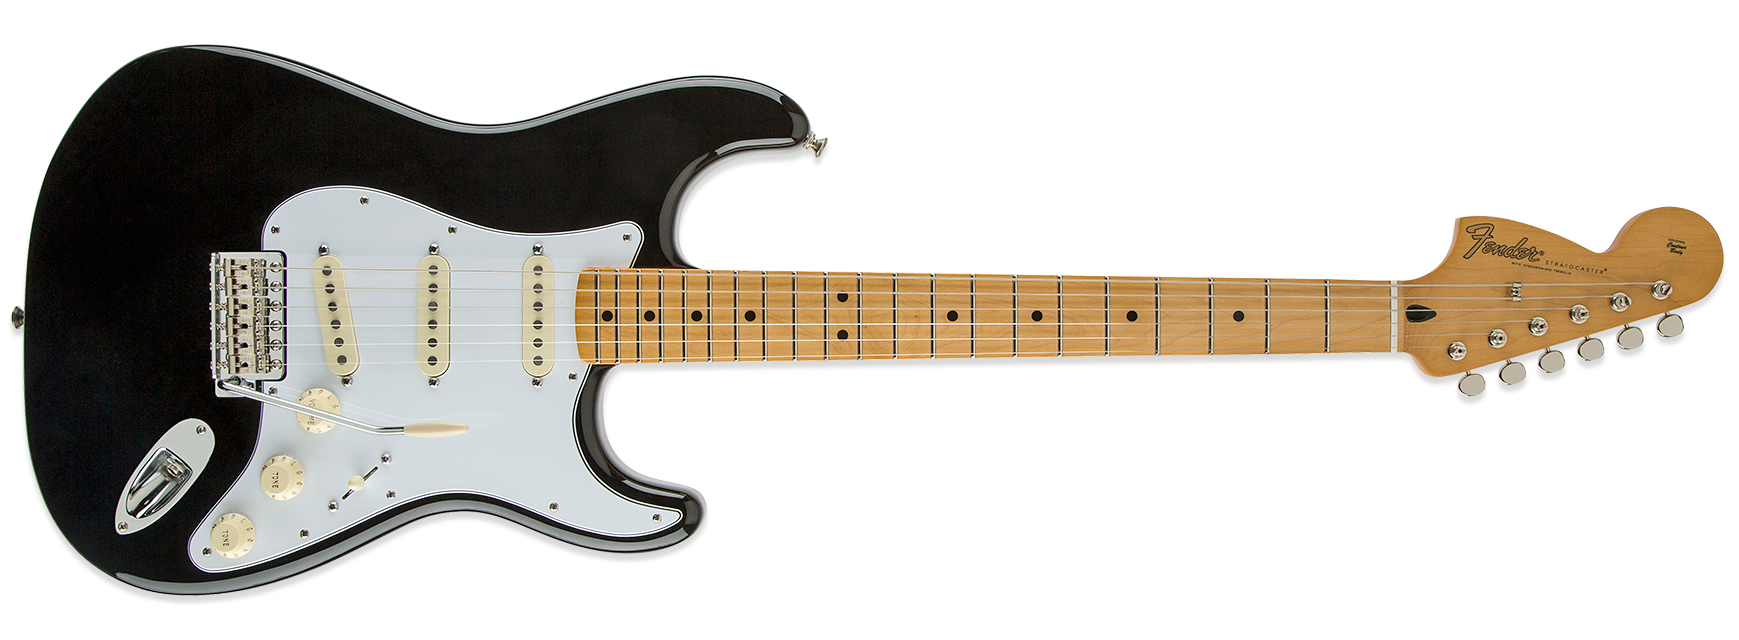 Fender Jimi Hendrix Stratocaster Black